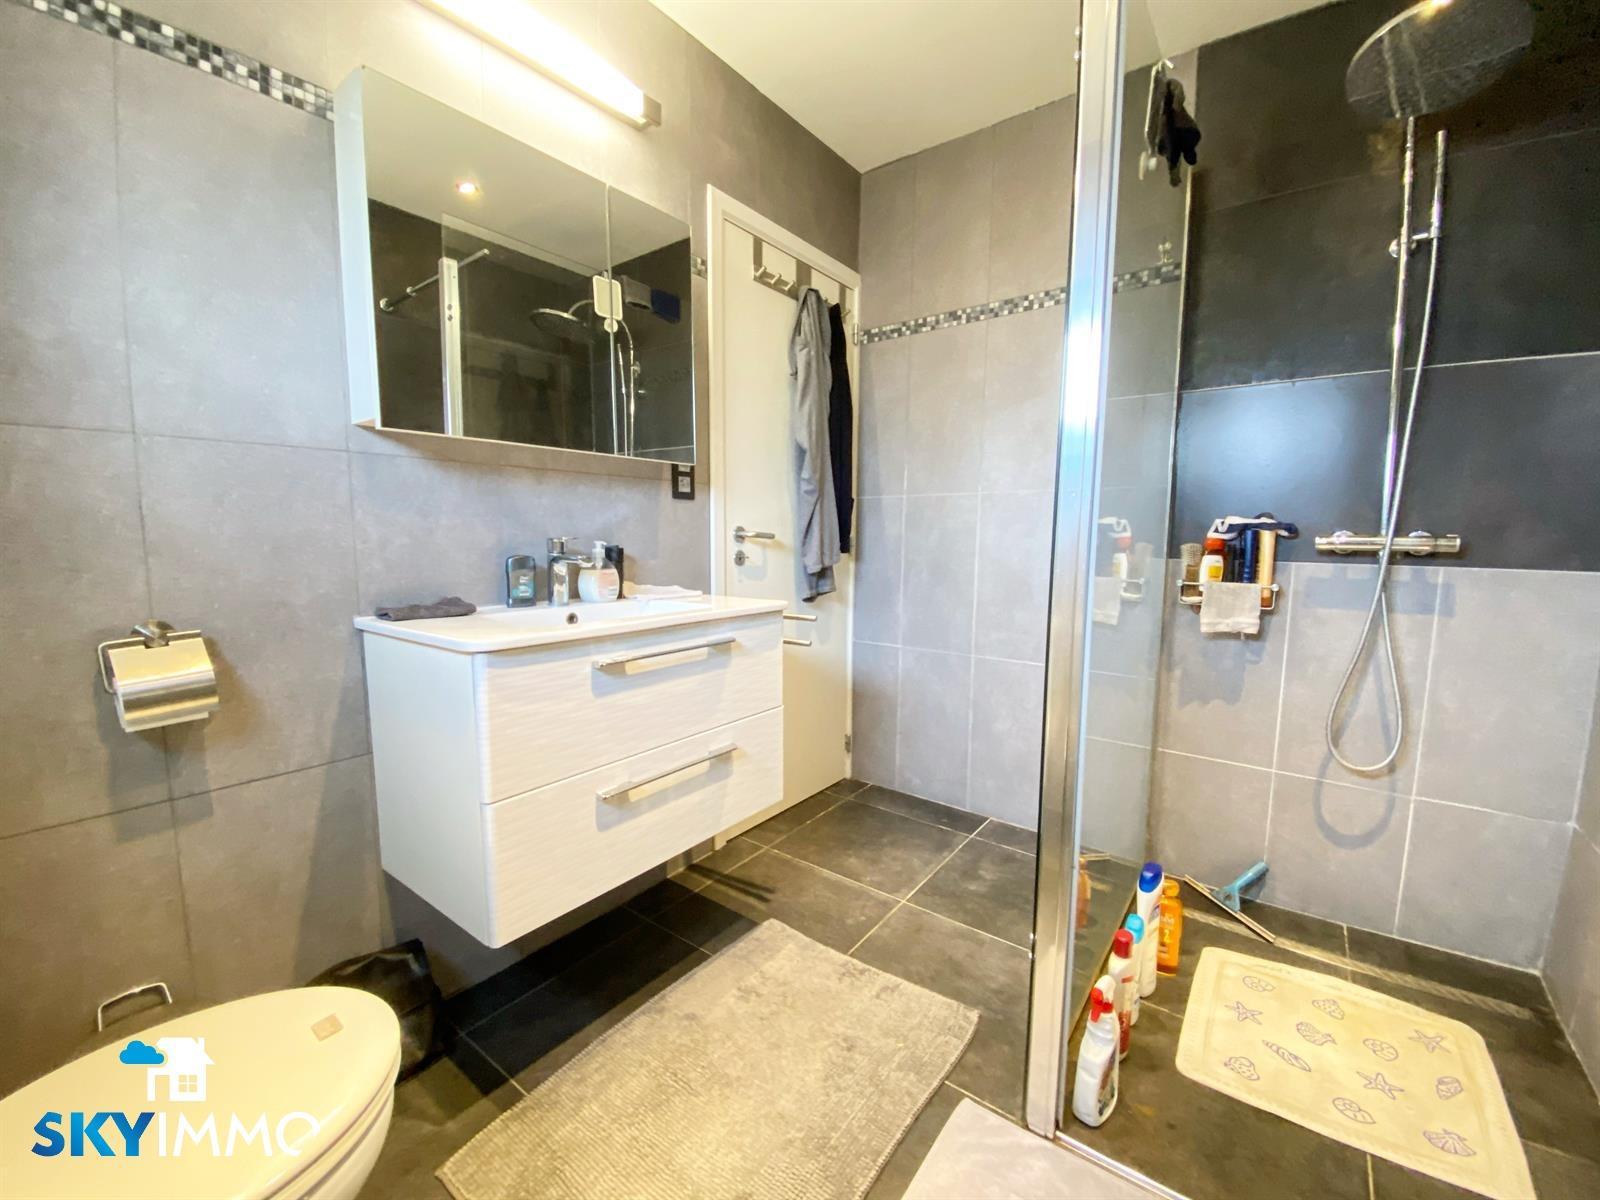 Maison - Saint-Nicolas - #4287983-12